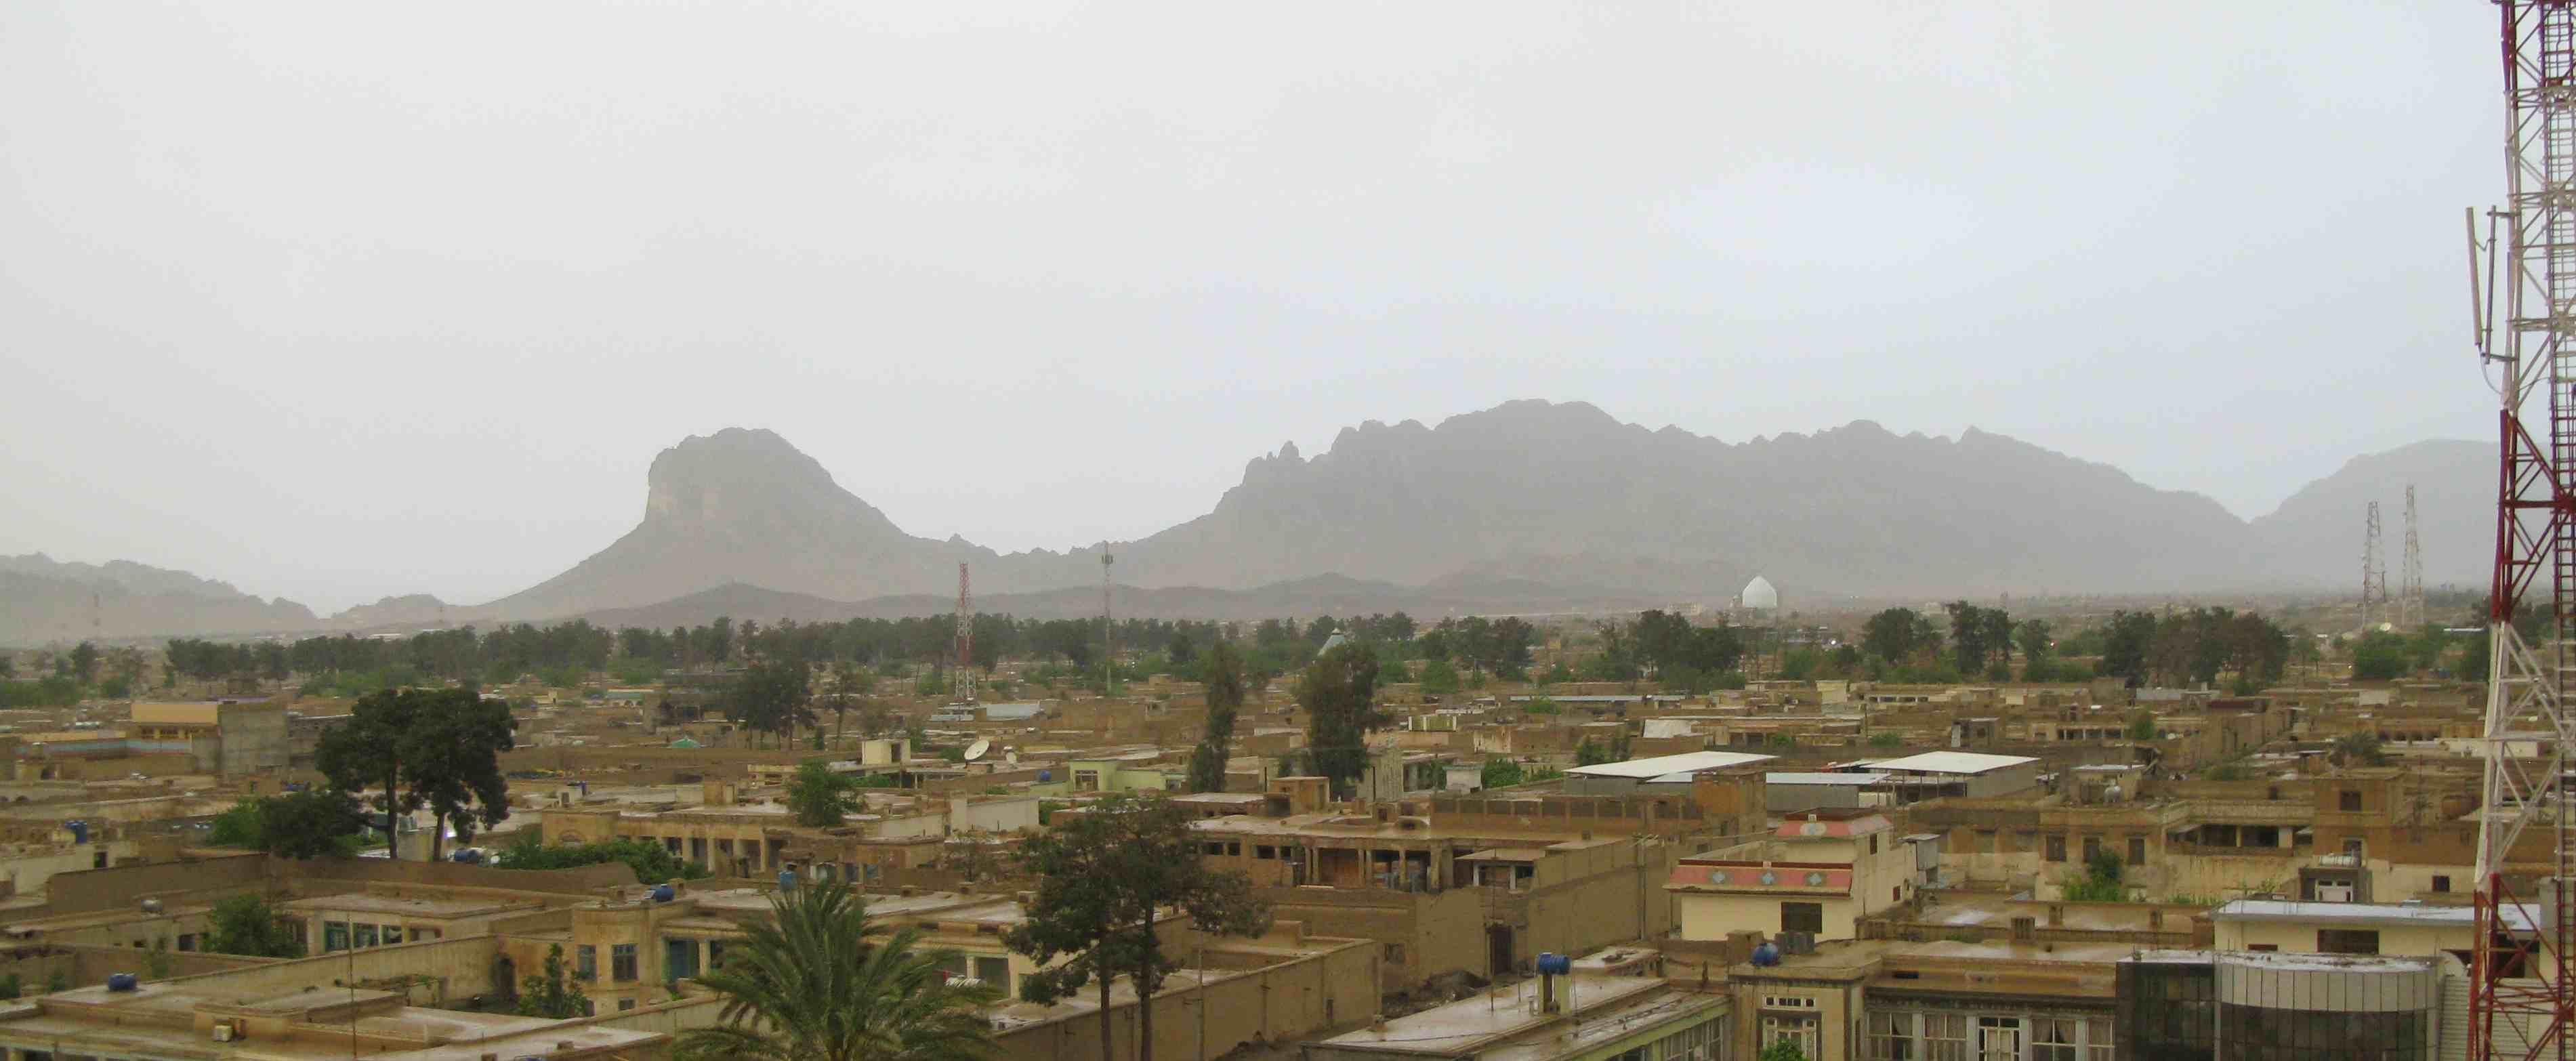 http://frontlineclub.com/blogs/alex/Kandahar%28small%29.jpg